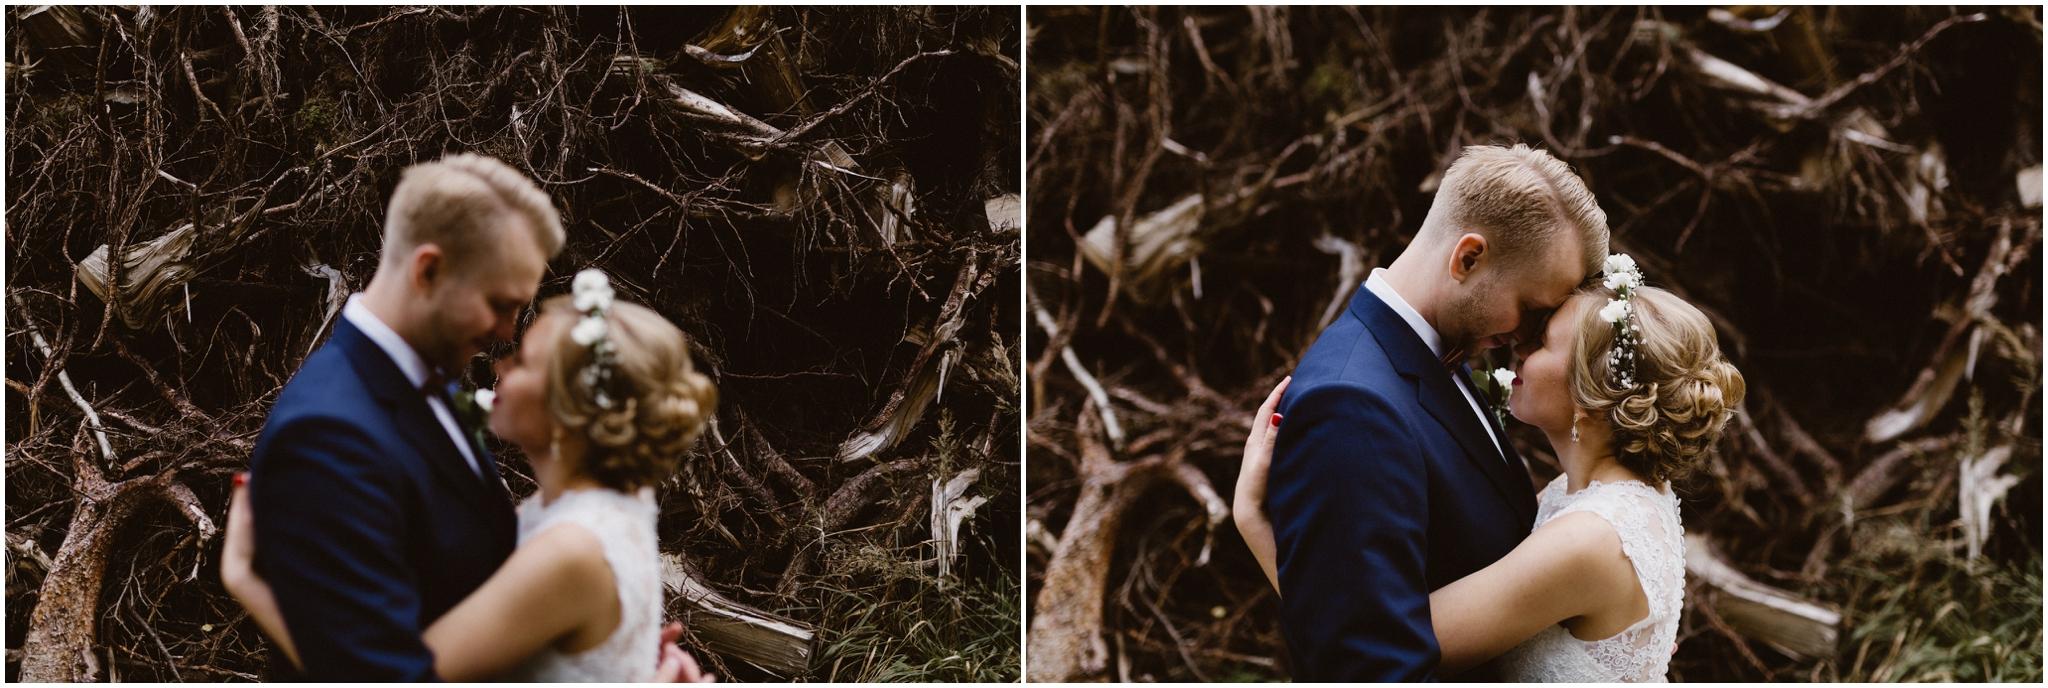 Leevi + Susanna -- Patrick Karkkolainen Wedding Photographer + Adventurer-142.jpg